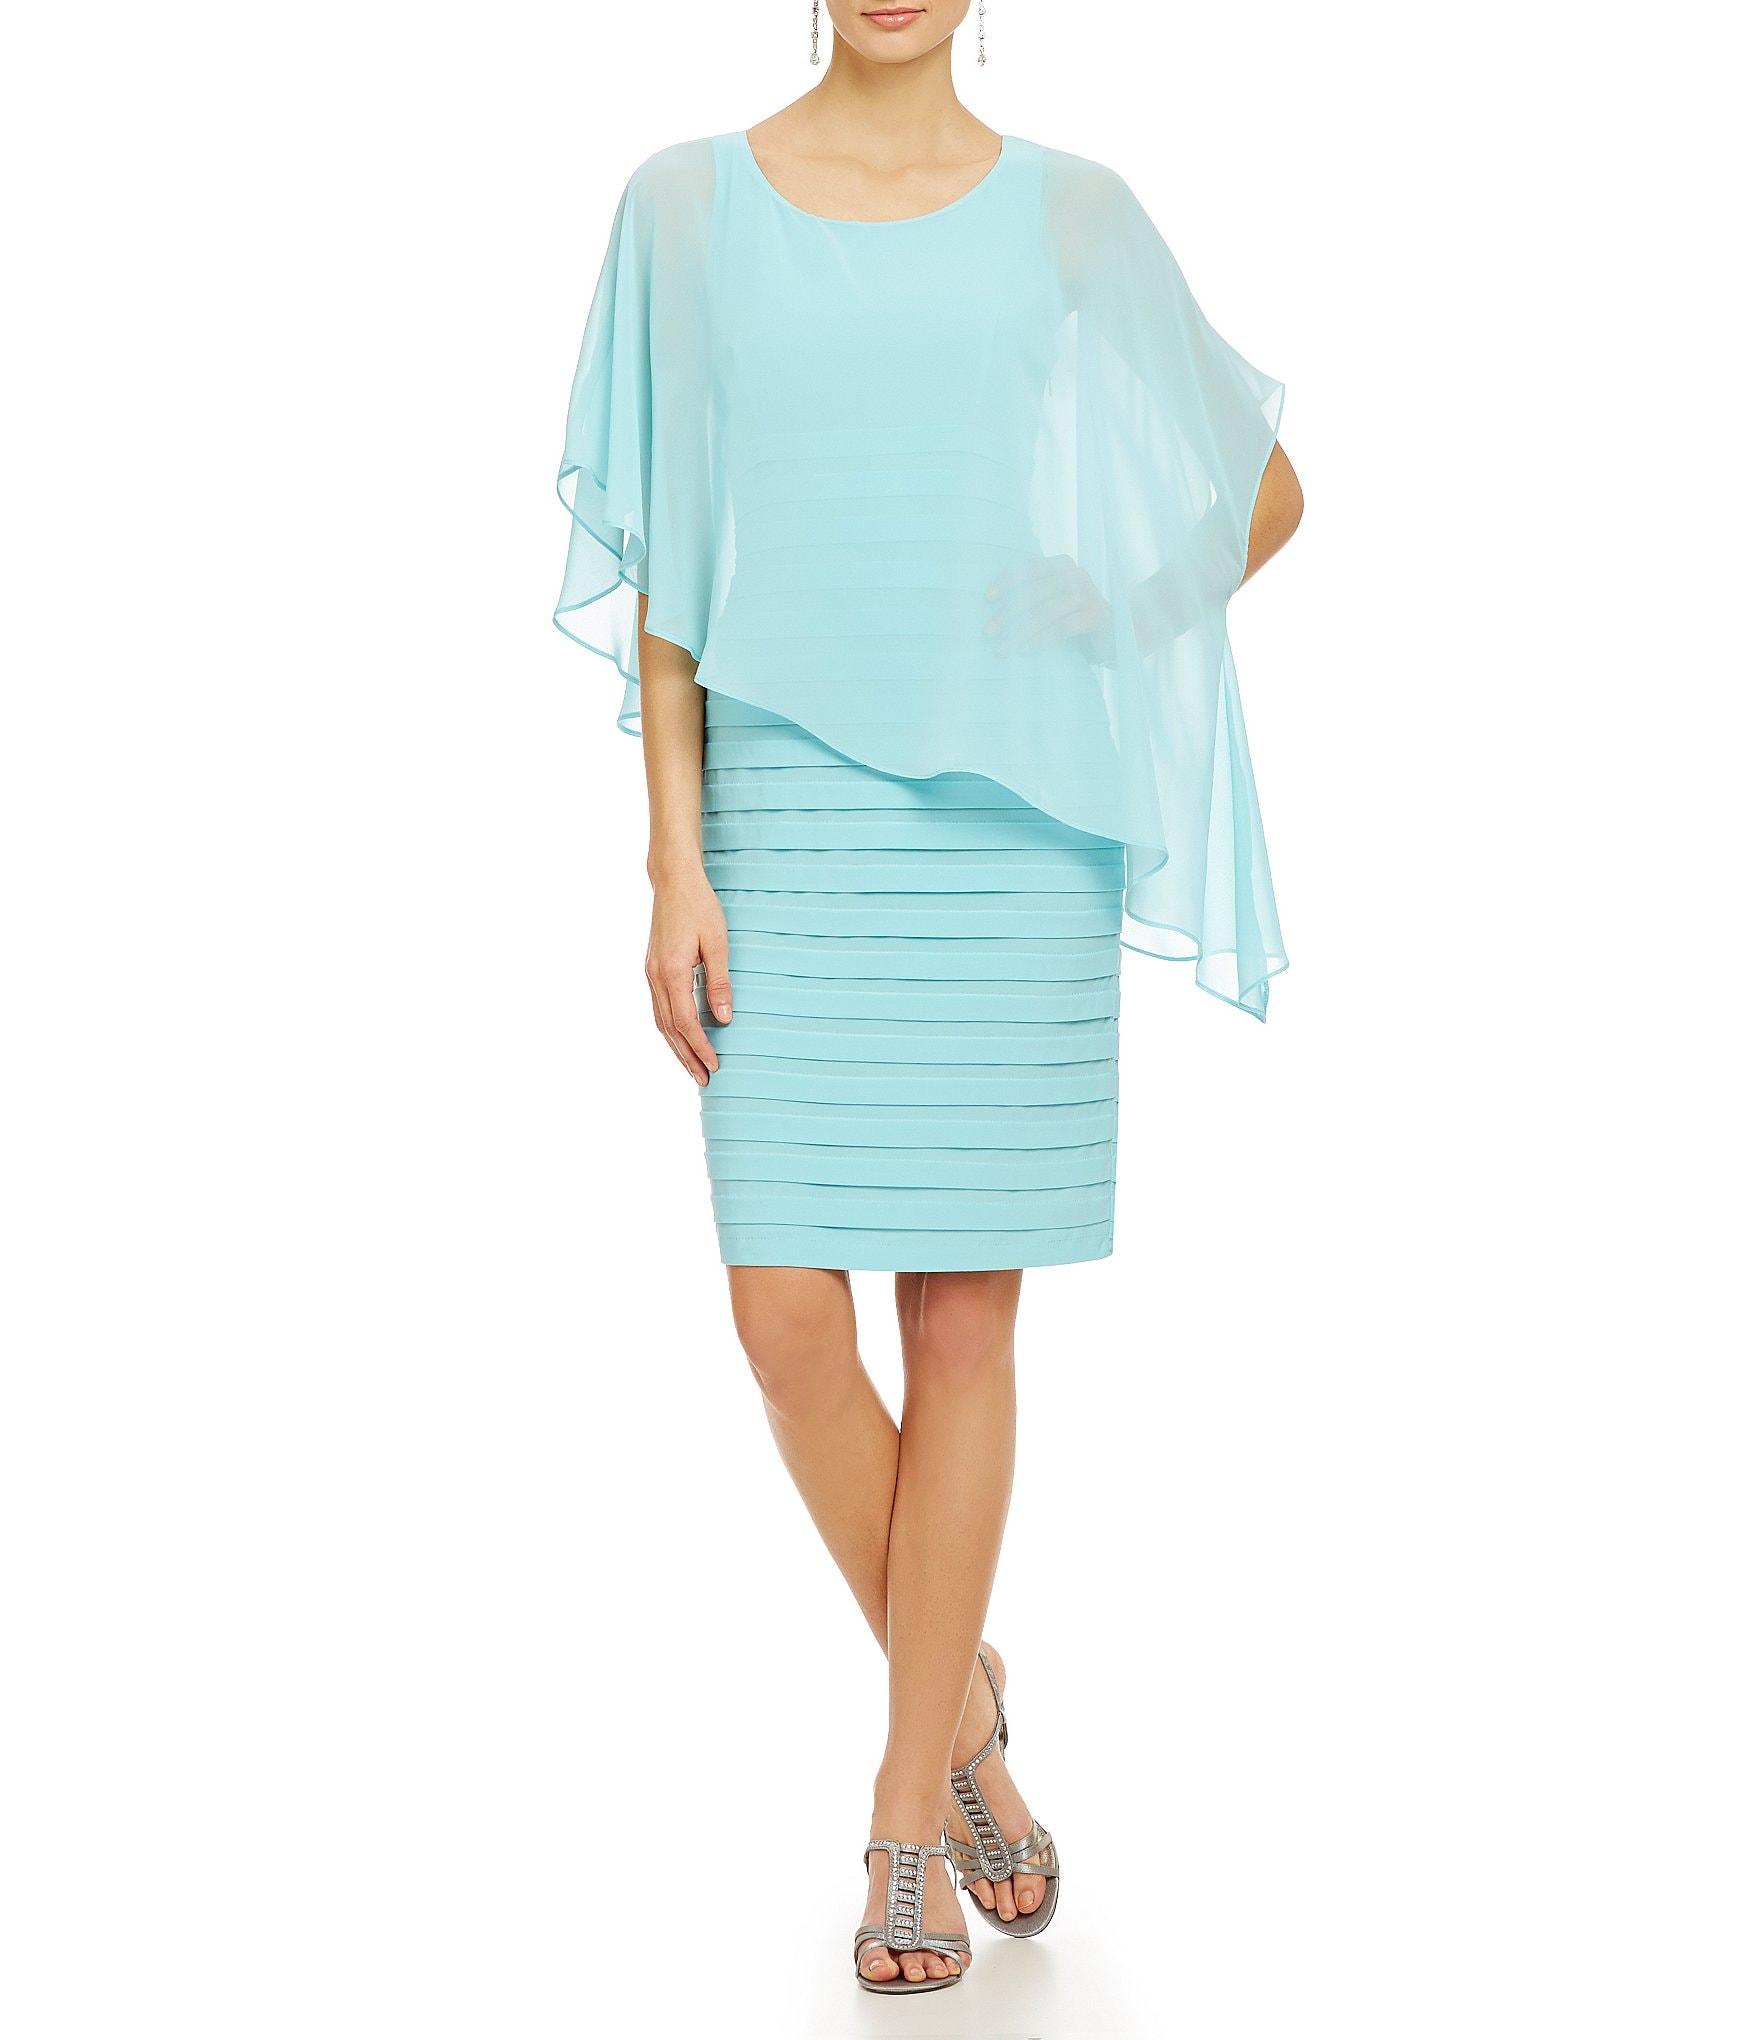 Adrianna Papell Chiffon Overlay Dress Dillards